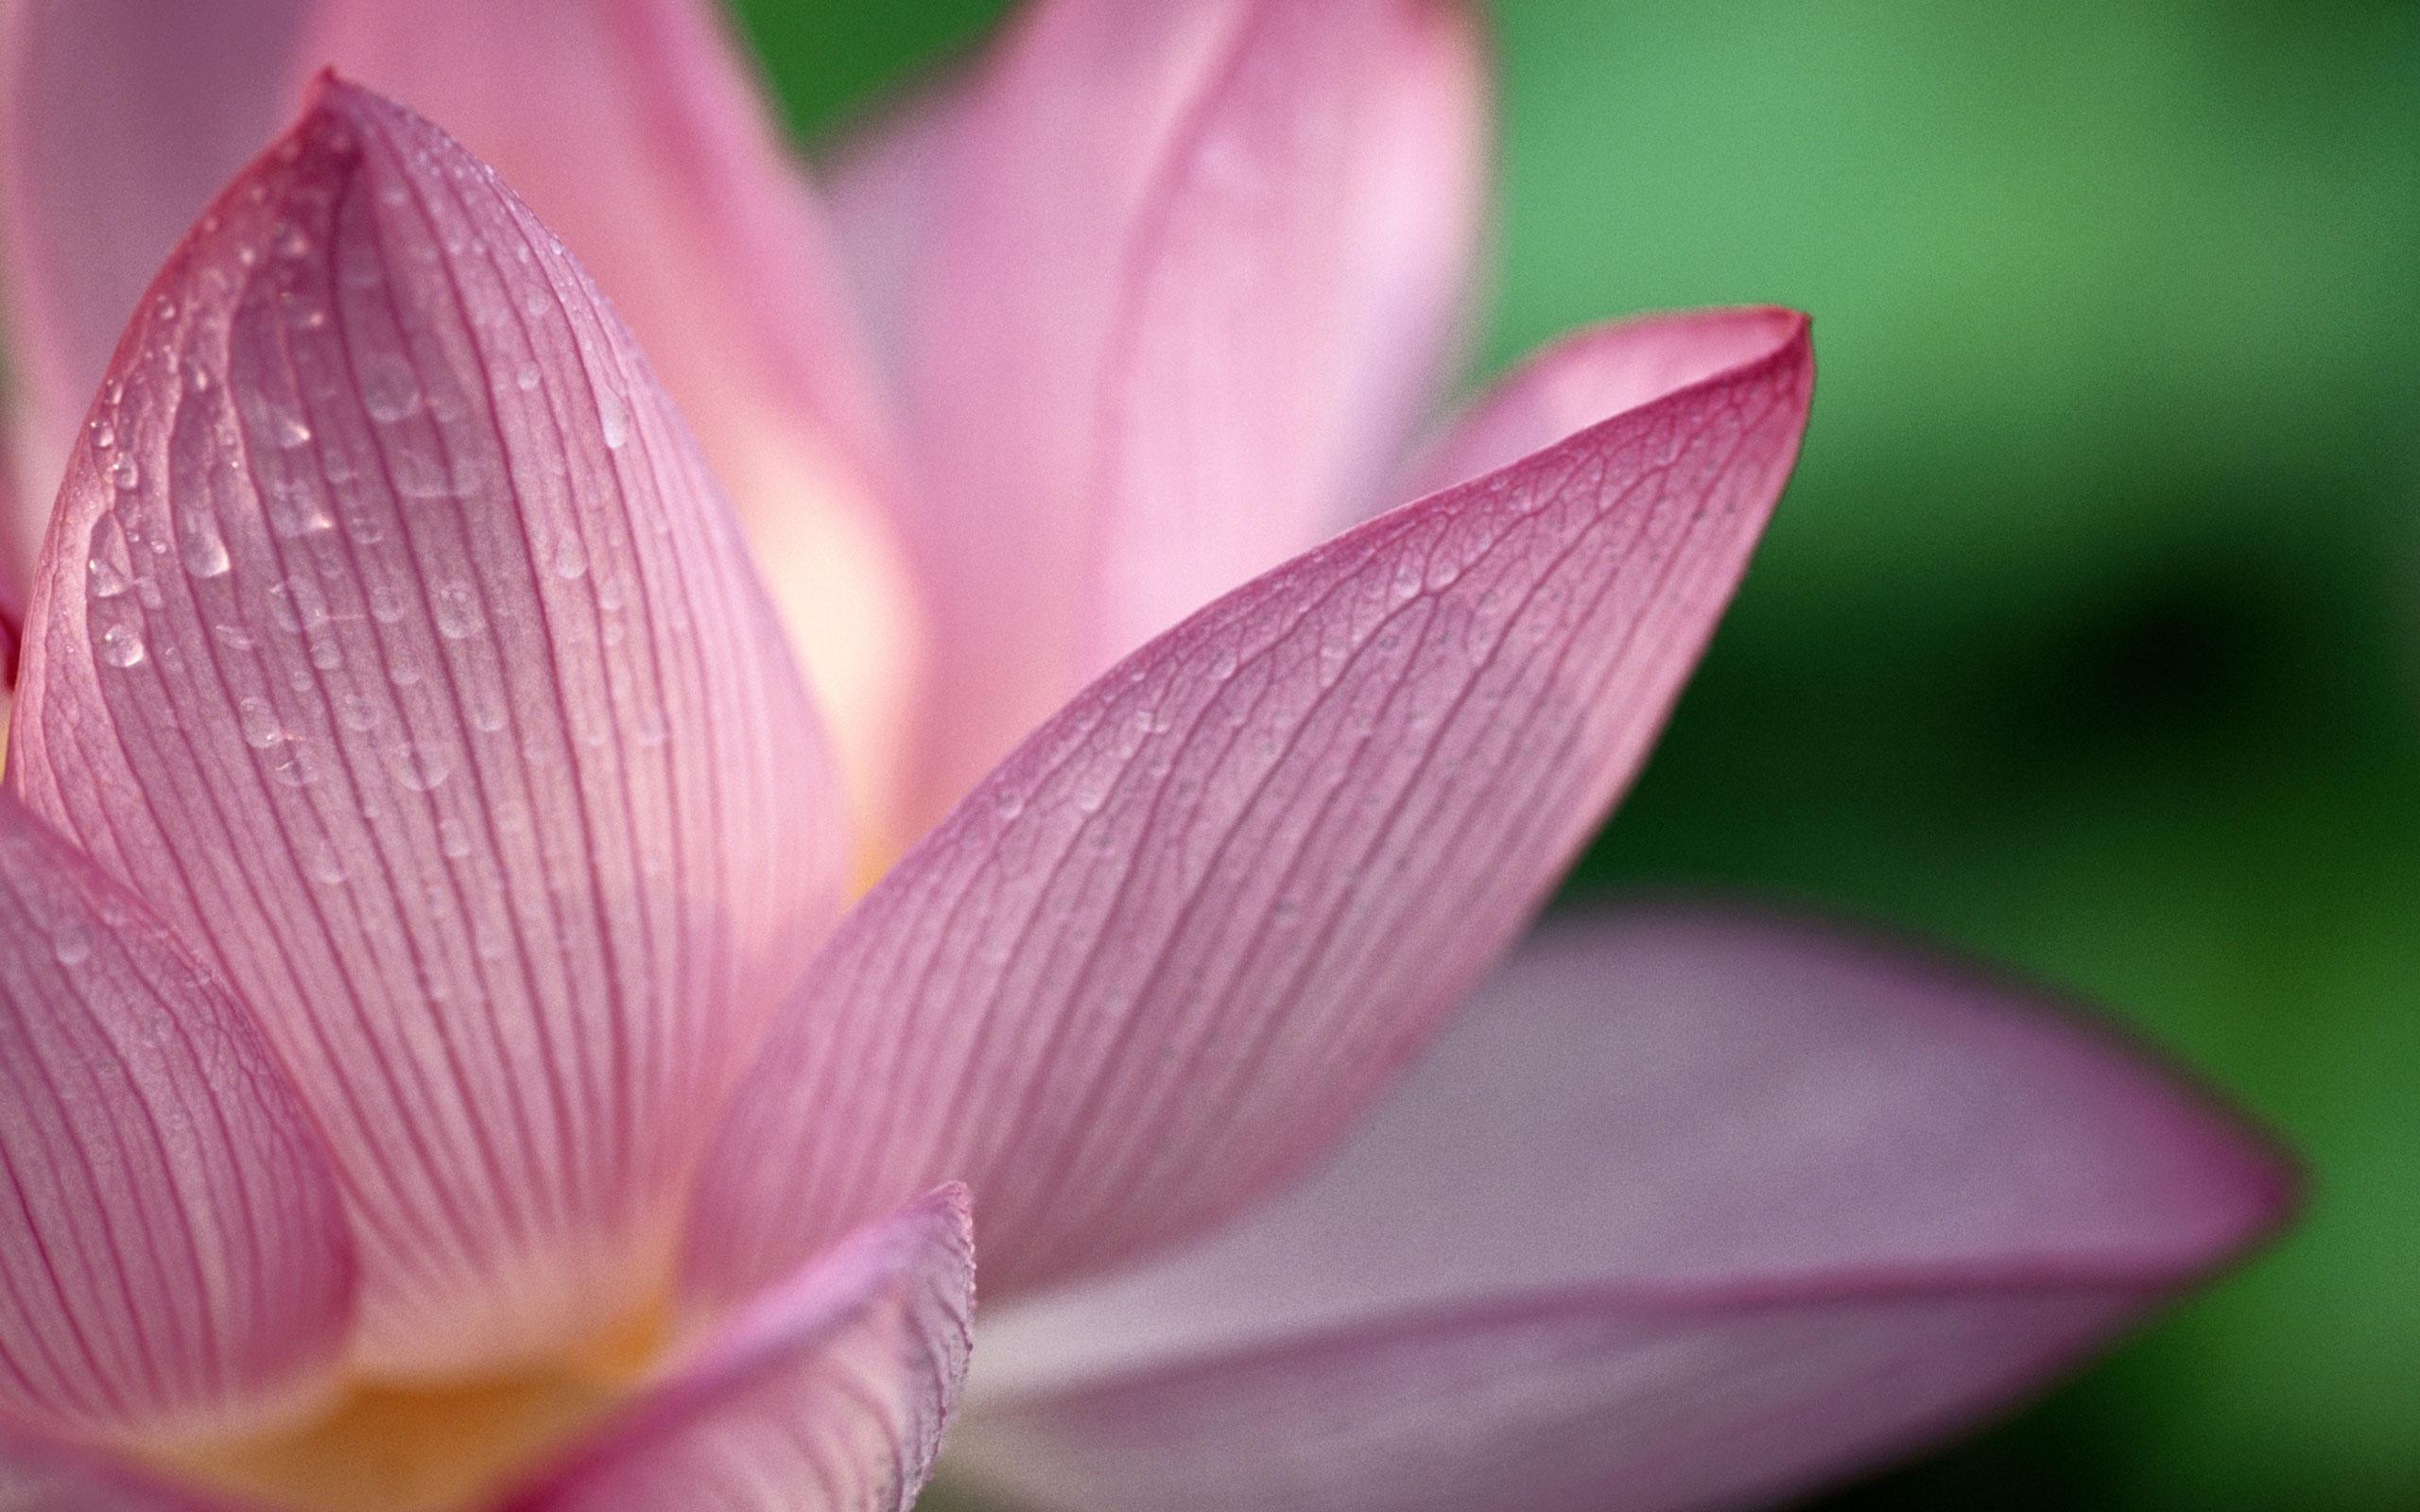 Lotus Flower Wallpaper HD